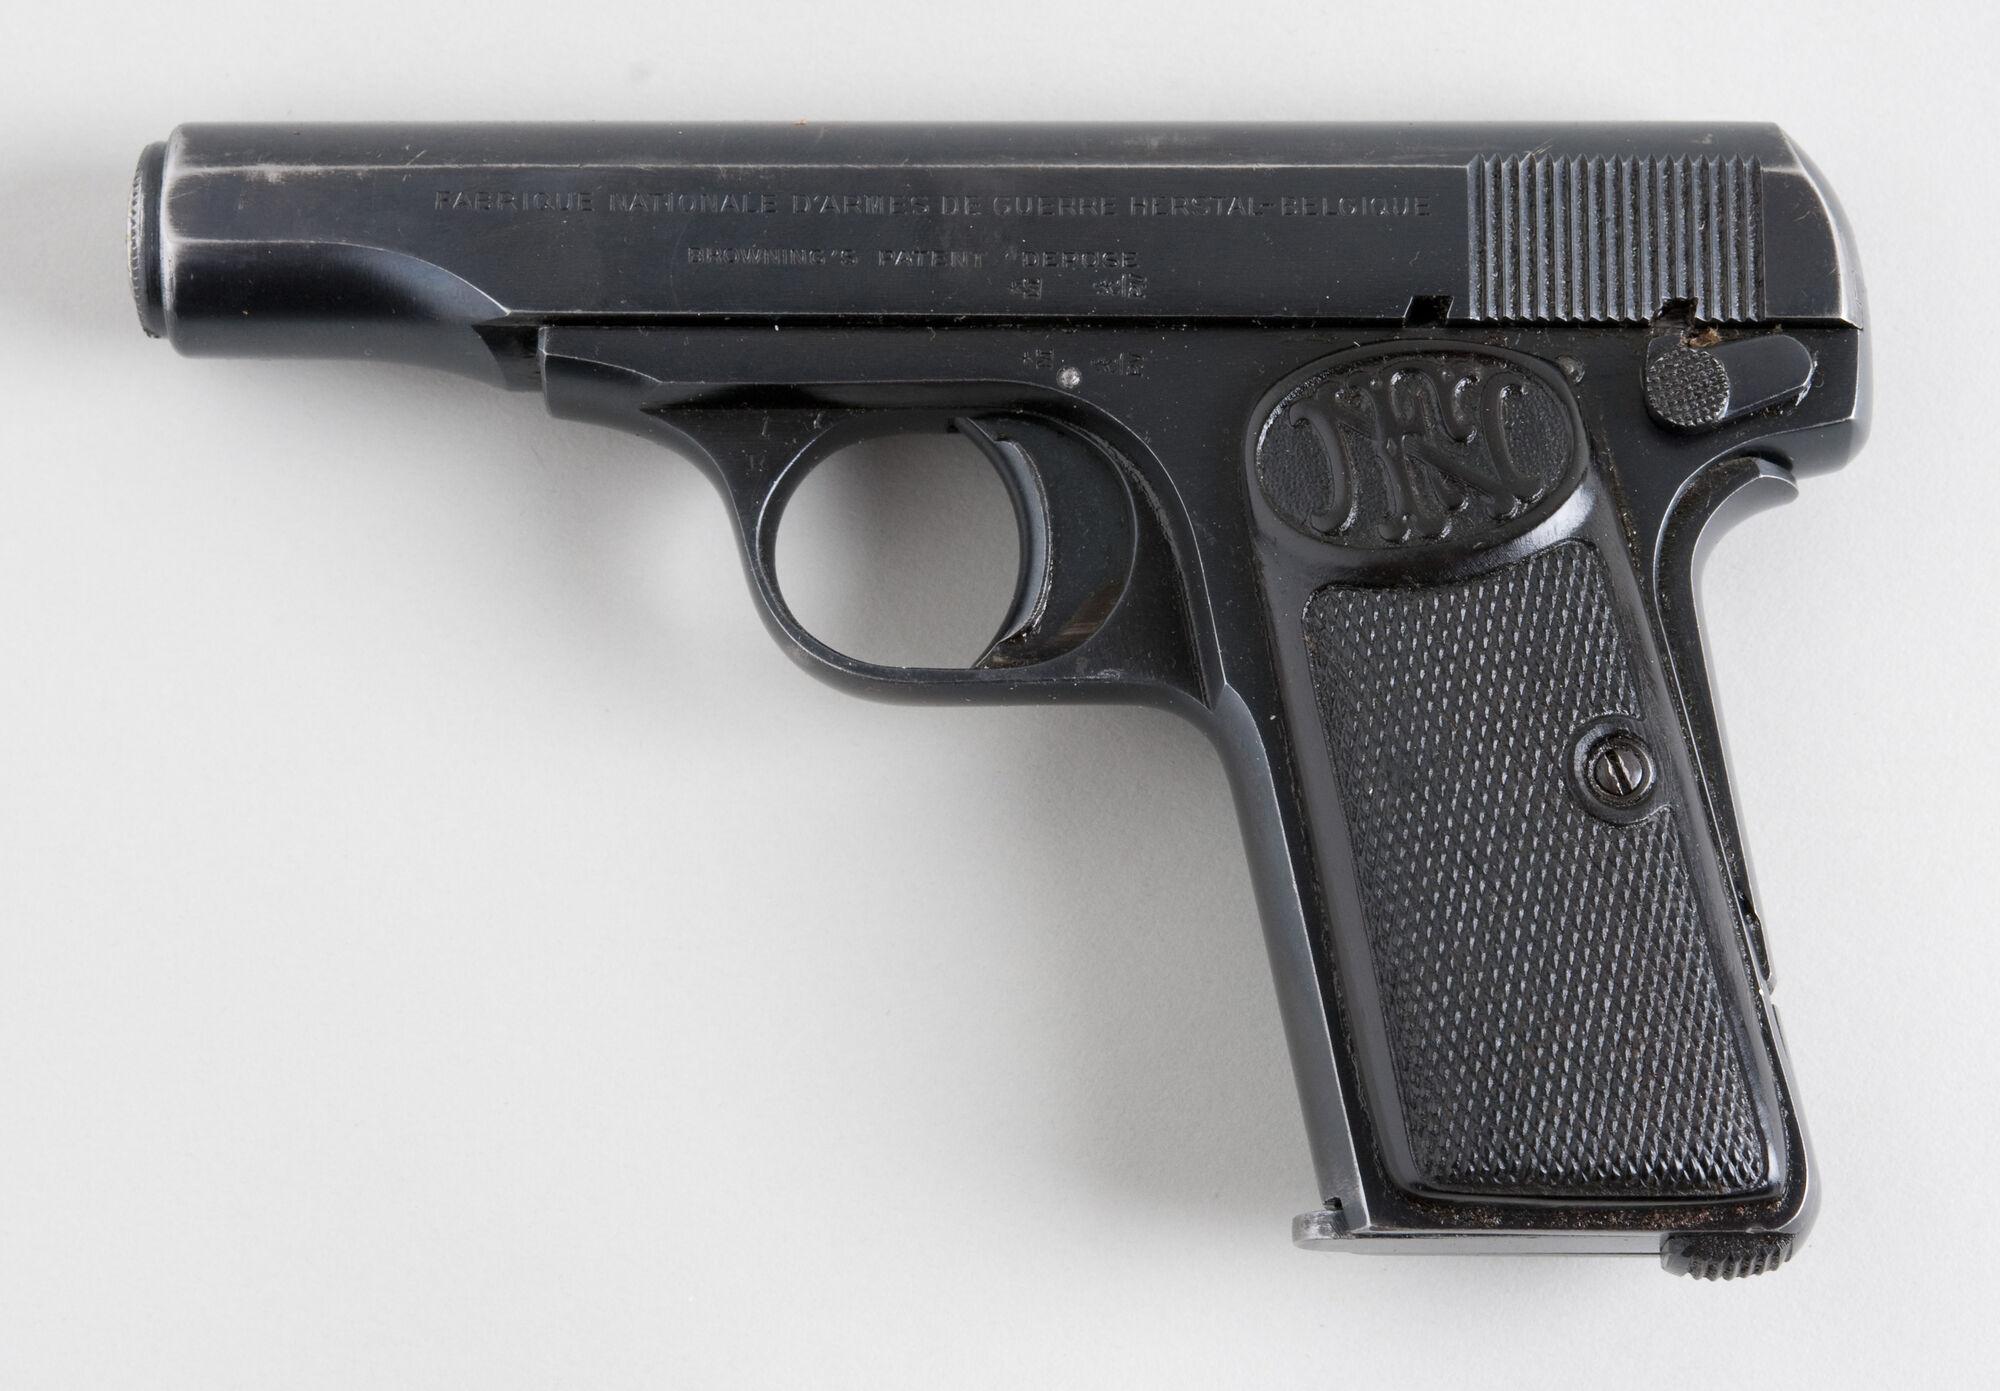 Cybergun FN 5-7 Five-Seven TAN - CO2 GBB - Pull The Trigger